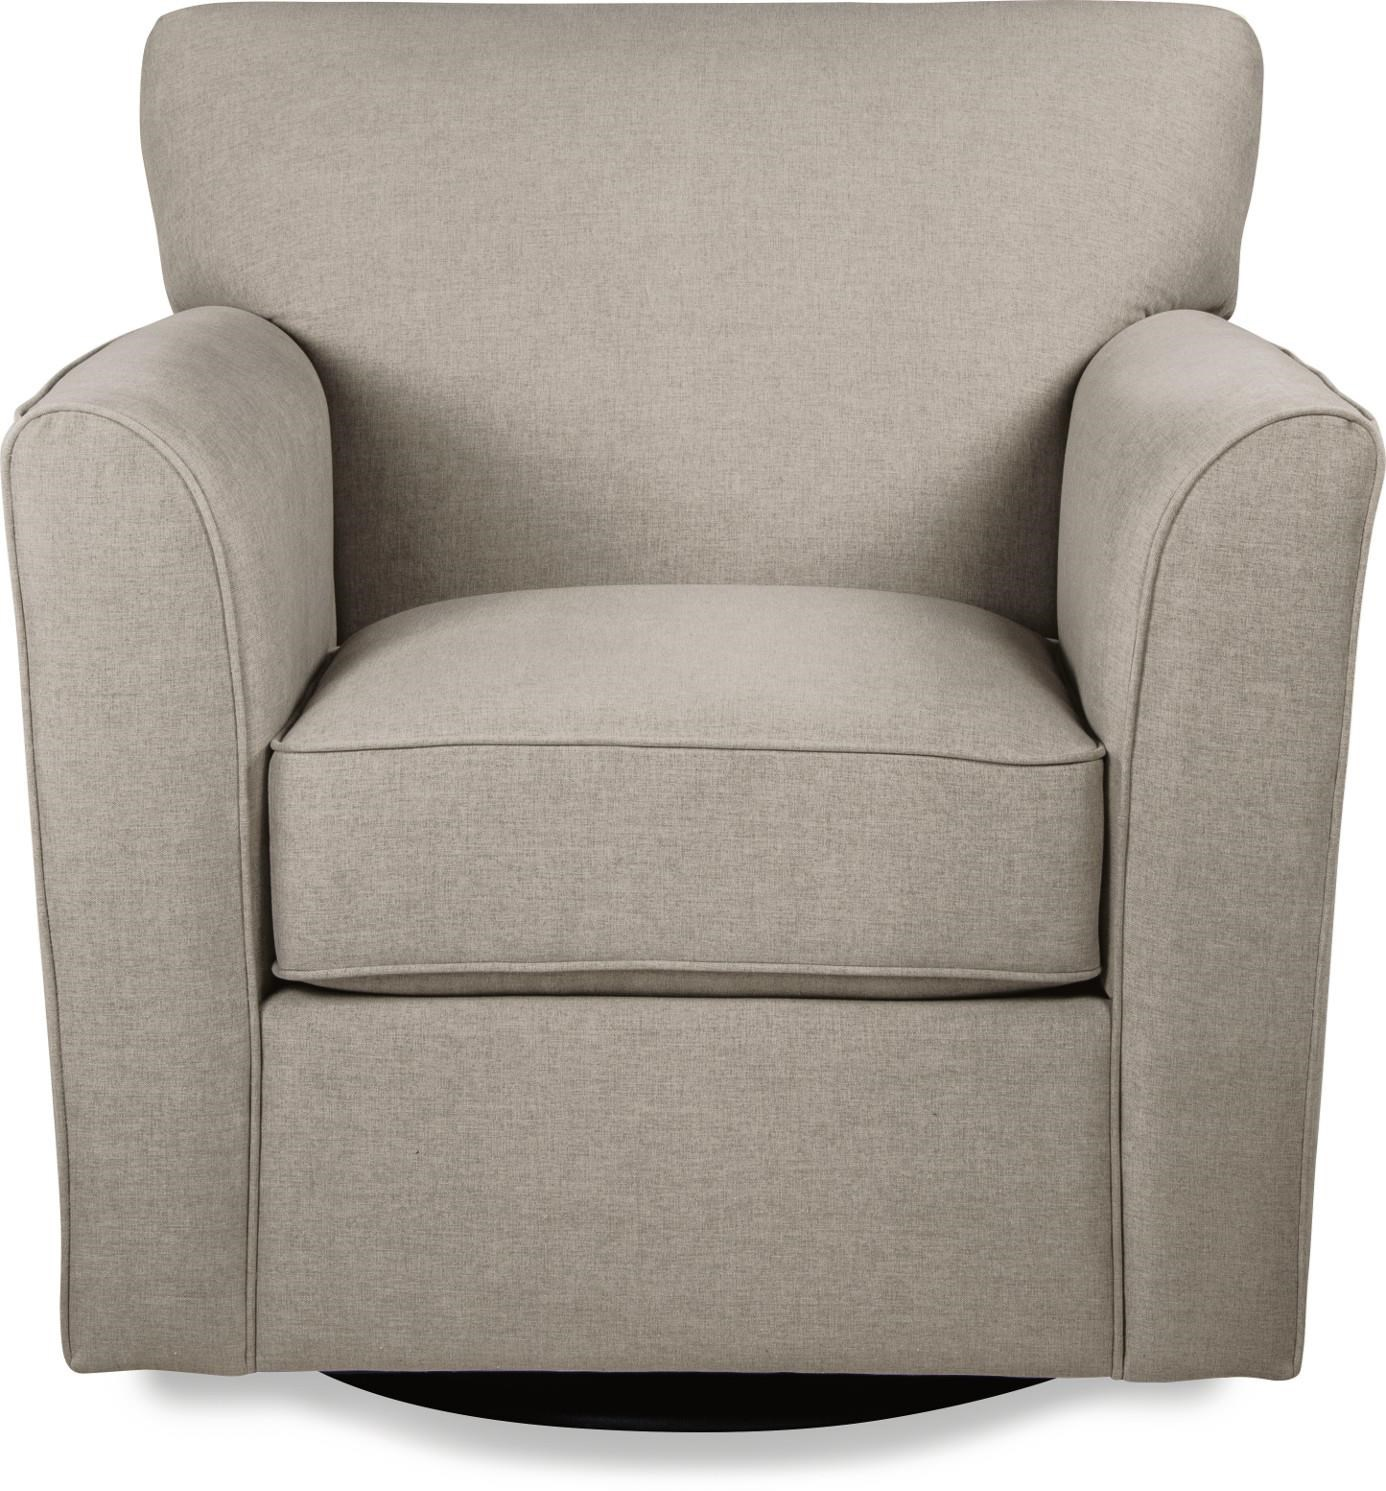 Allegra Swivel Chair by La-Z-Boy at Bennett's Furniture and Mattresses